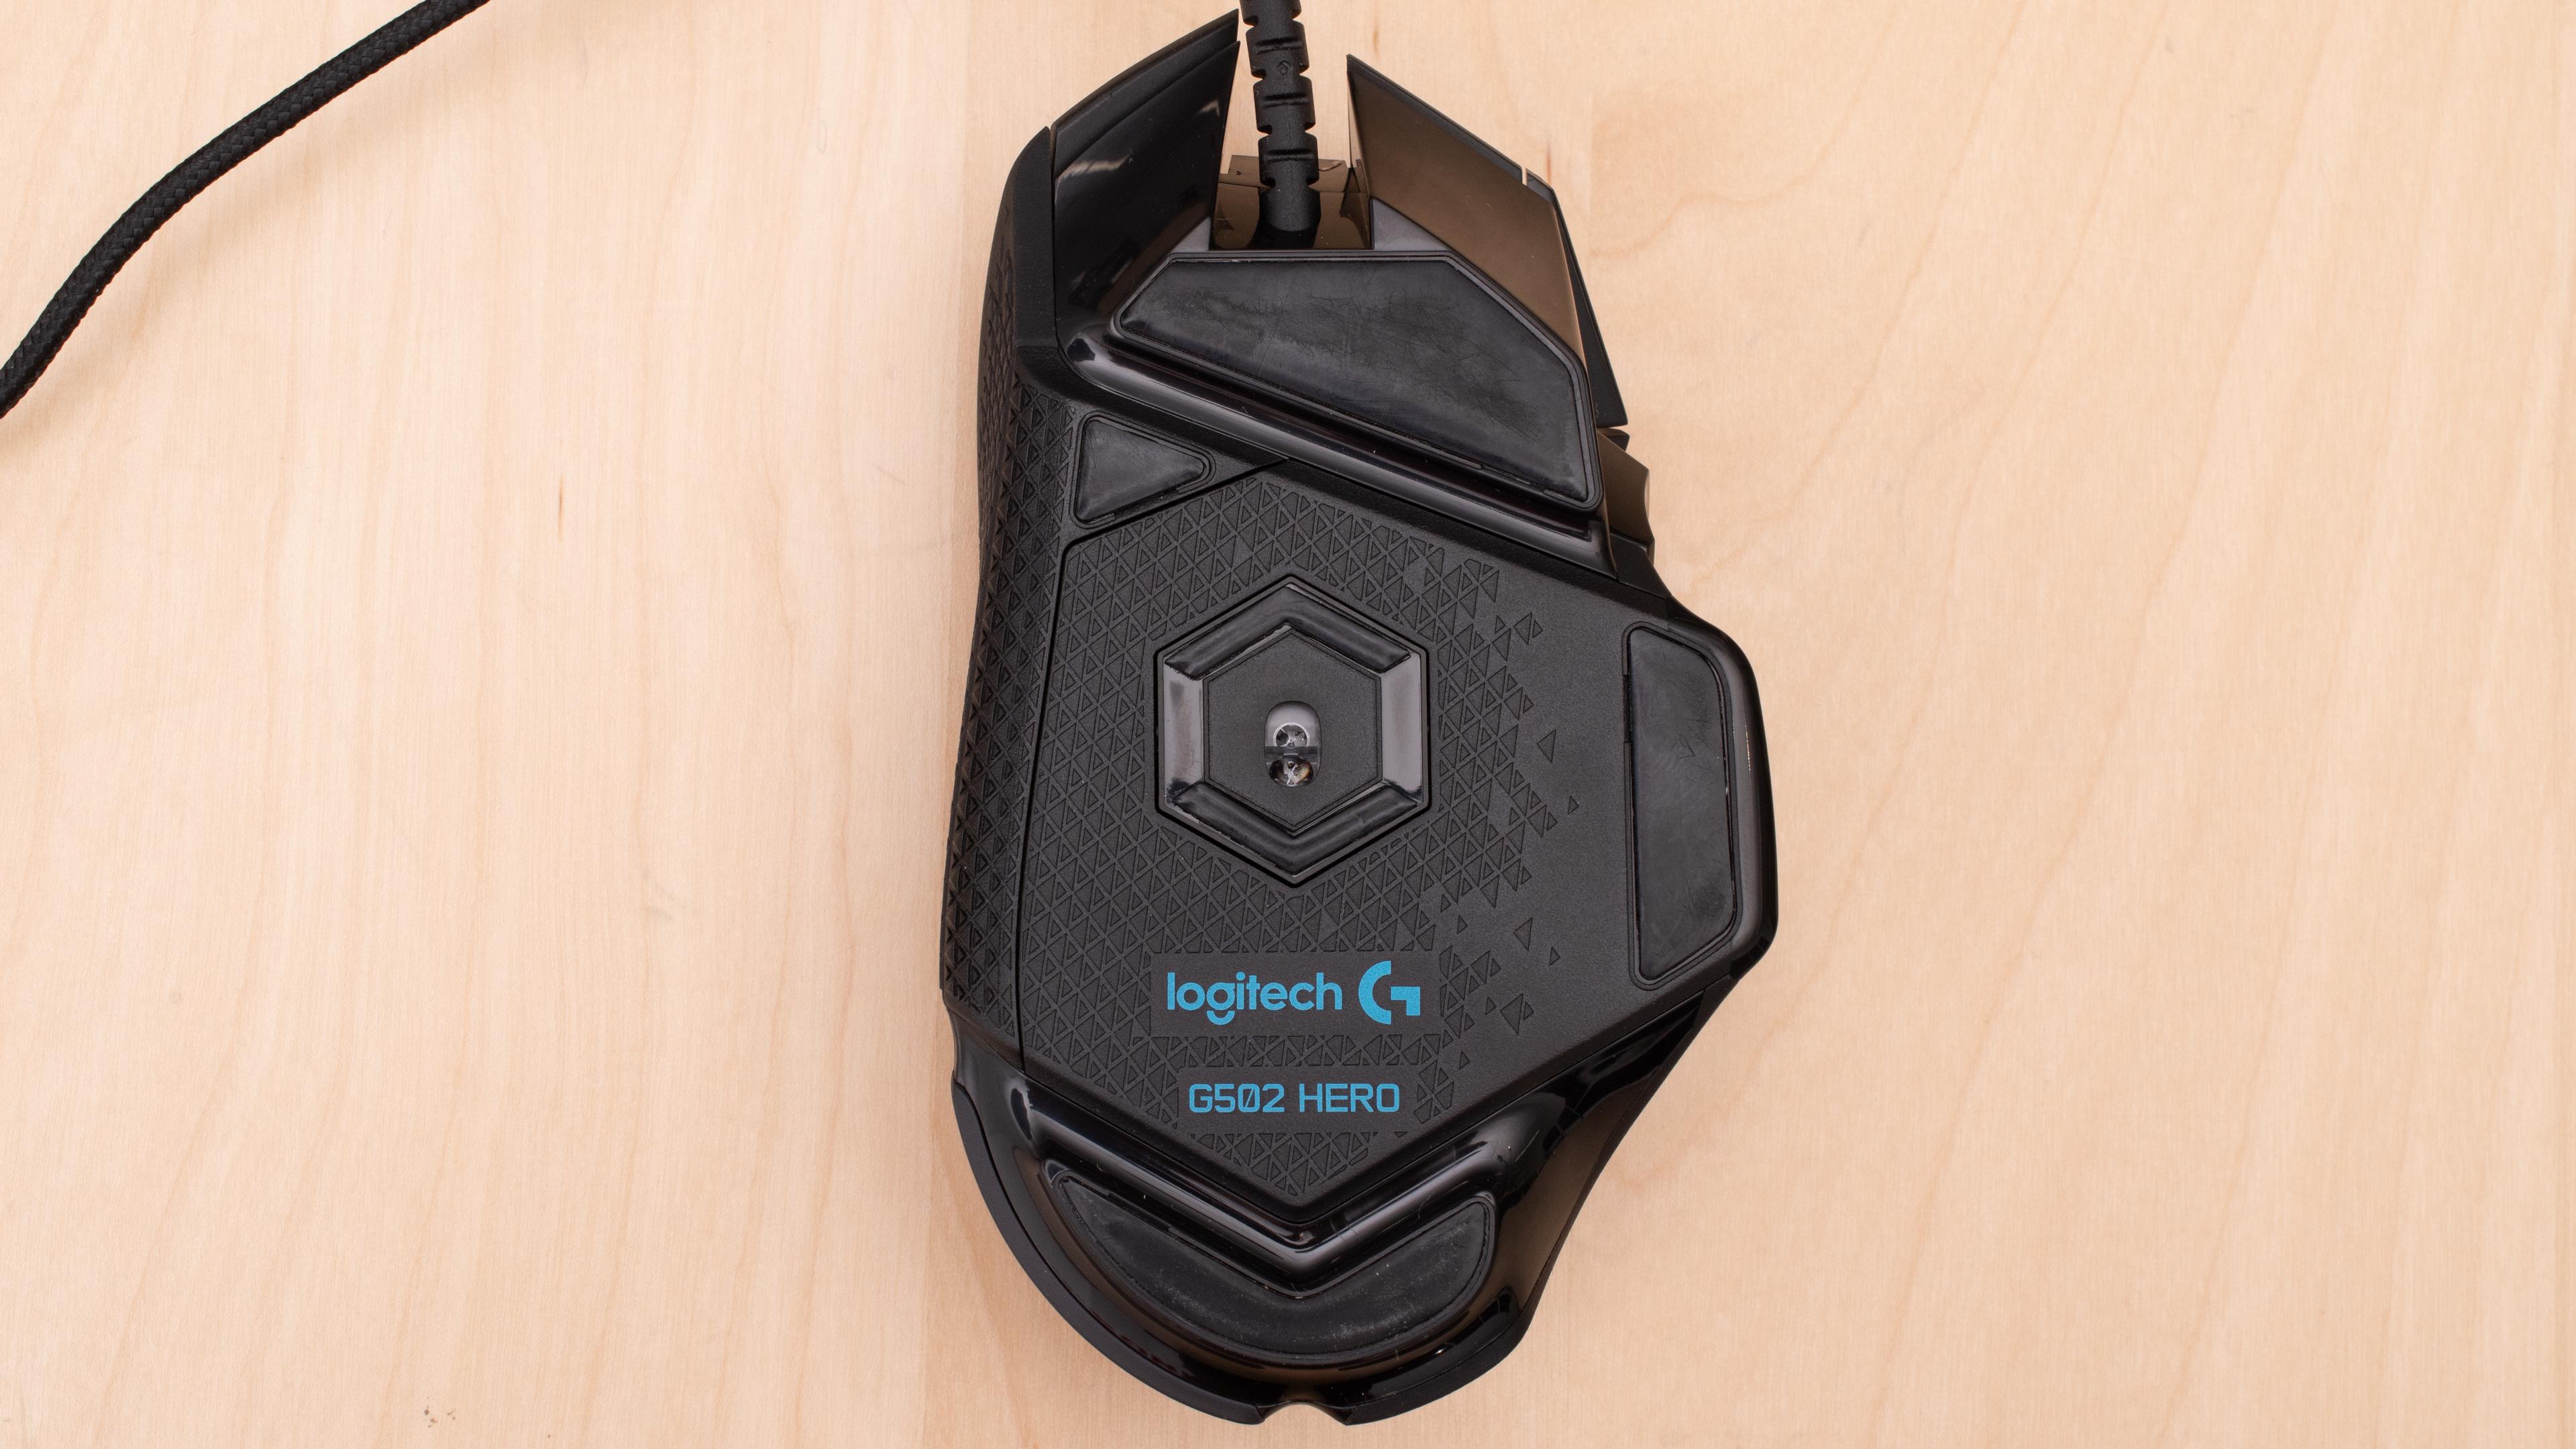 Logitech G502 Hero Review Rtings Com